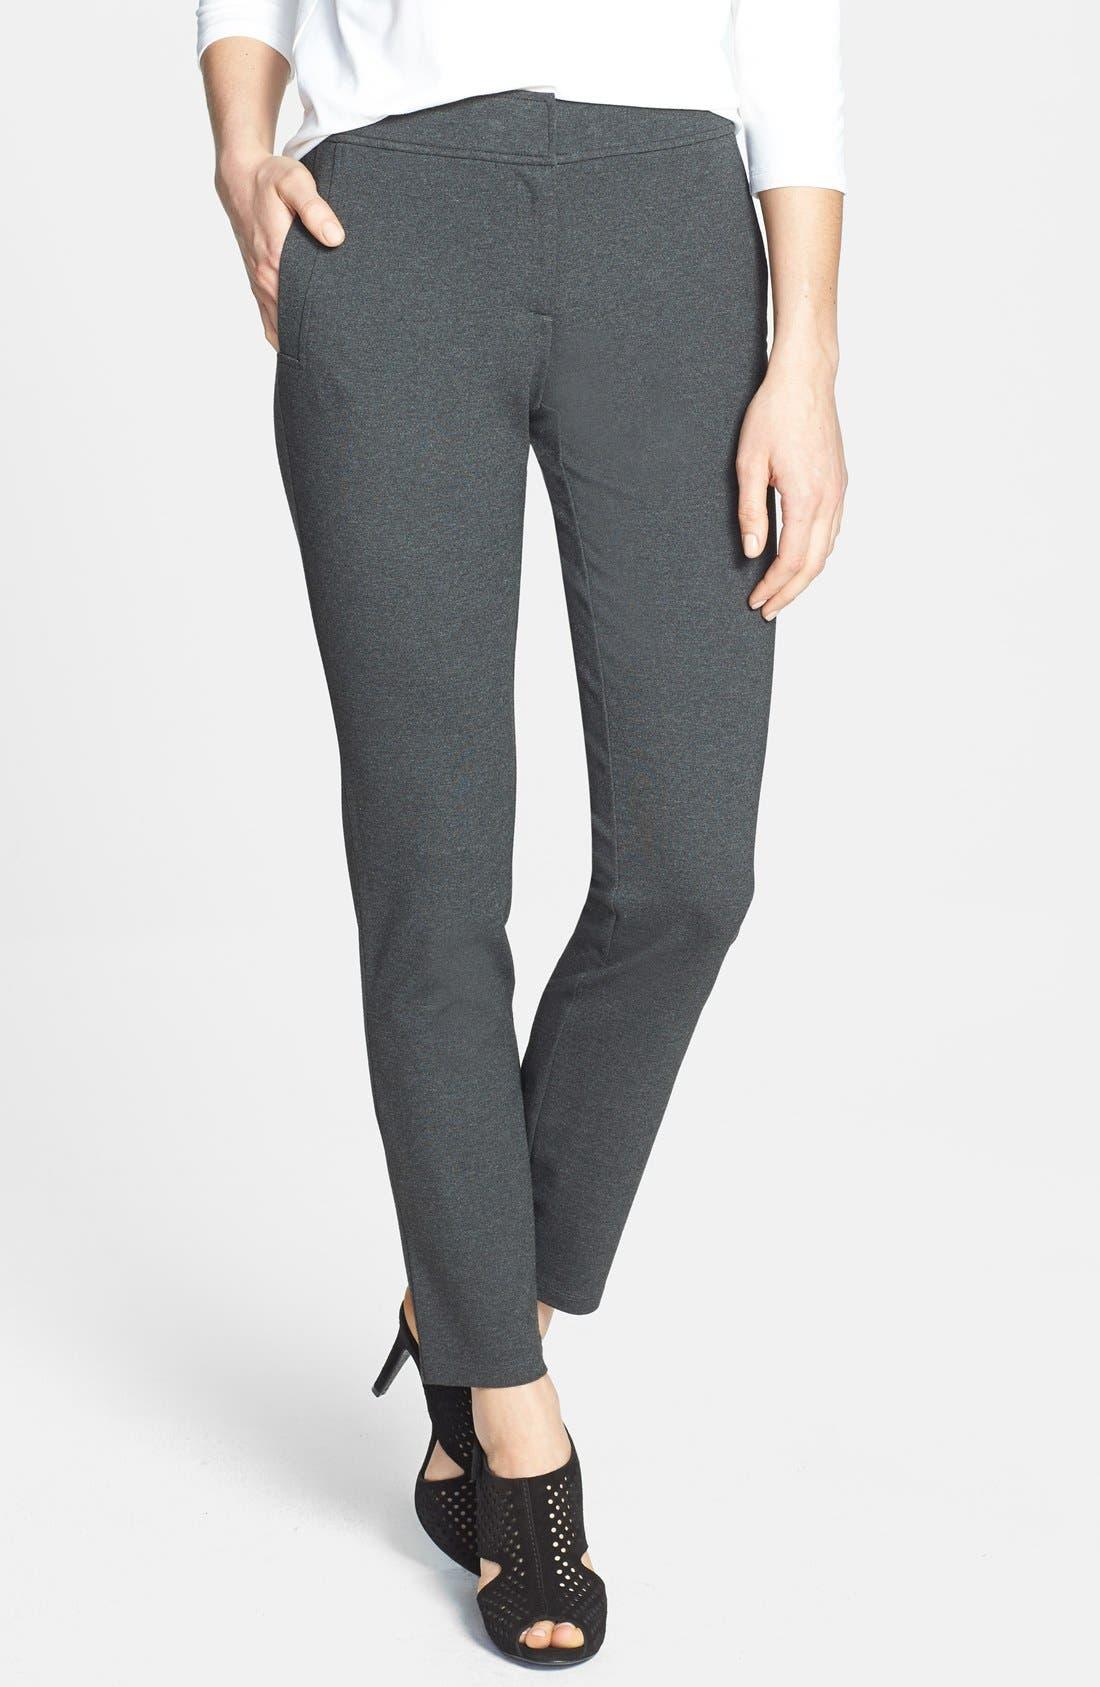 Alternate Image 1 Selected - Eileen Fisher Slim Knit Ankle Pants (Regular & Petite)